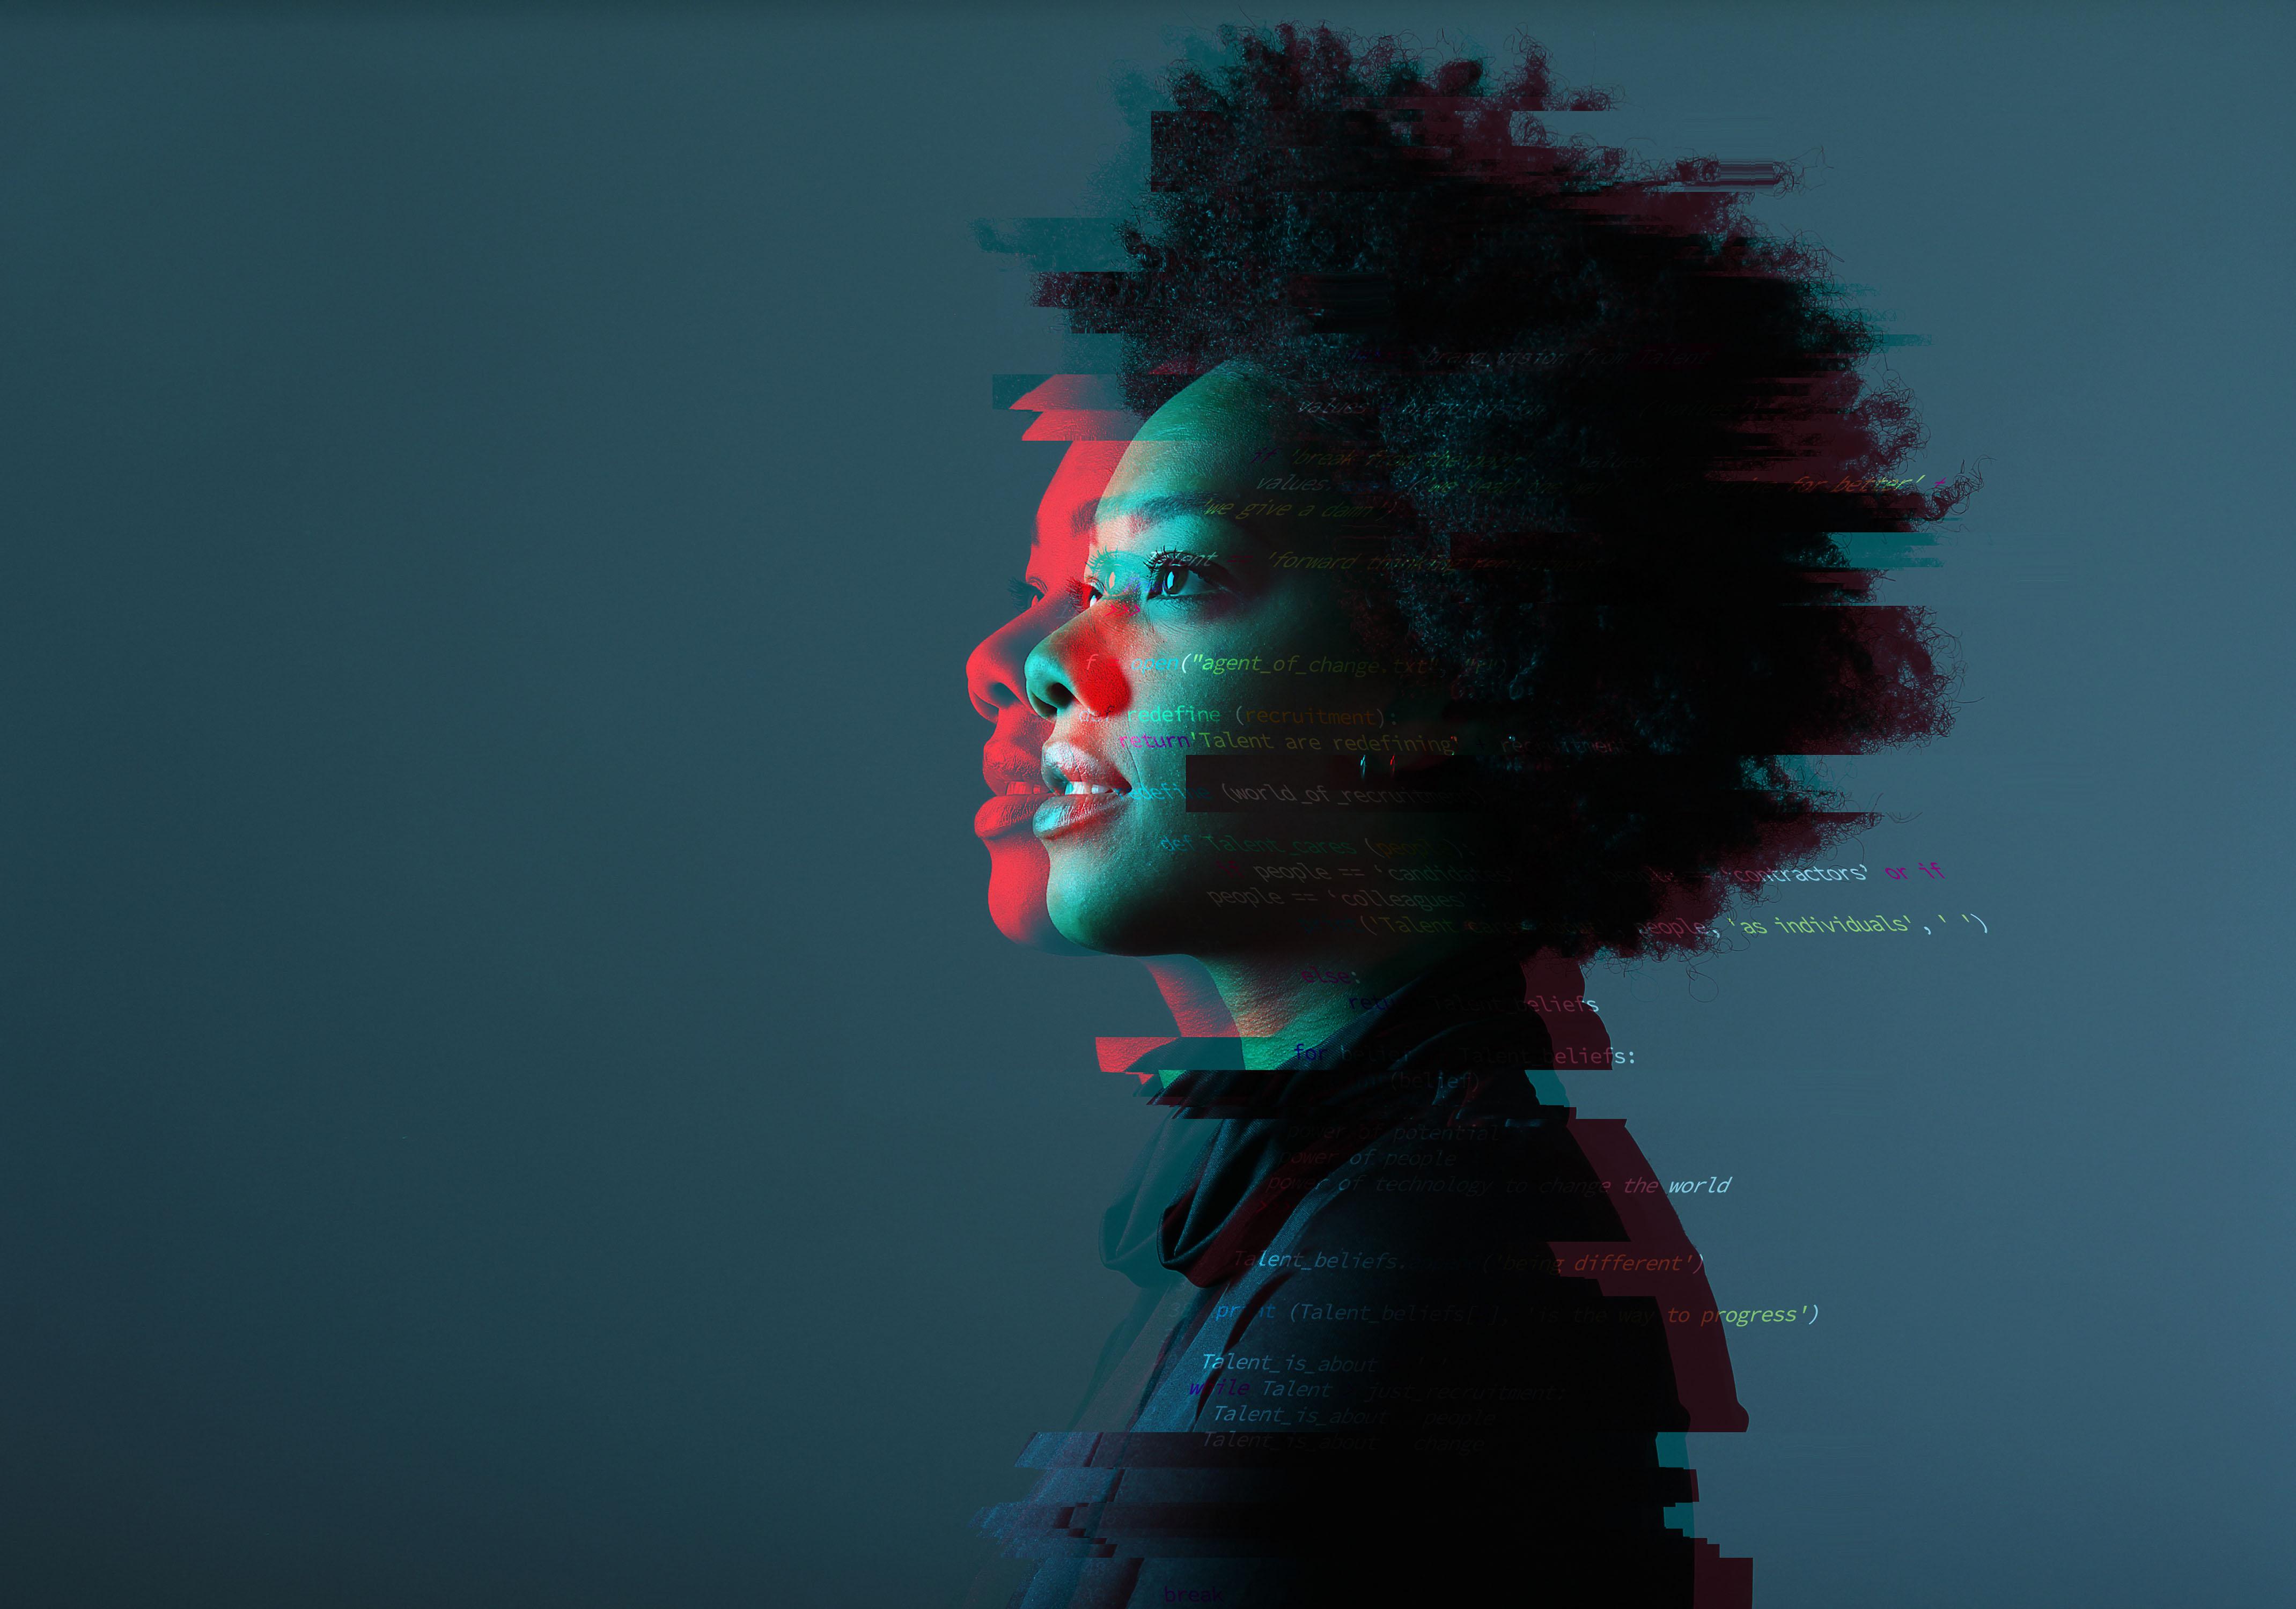 An optimistic woman with a glitchy code overlay